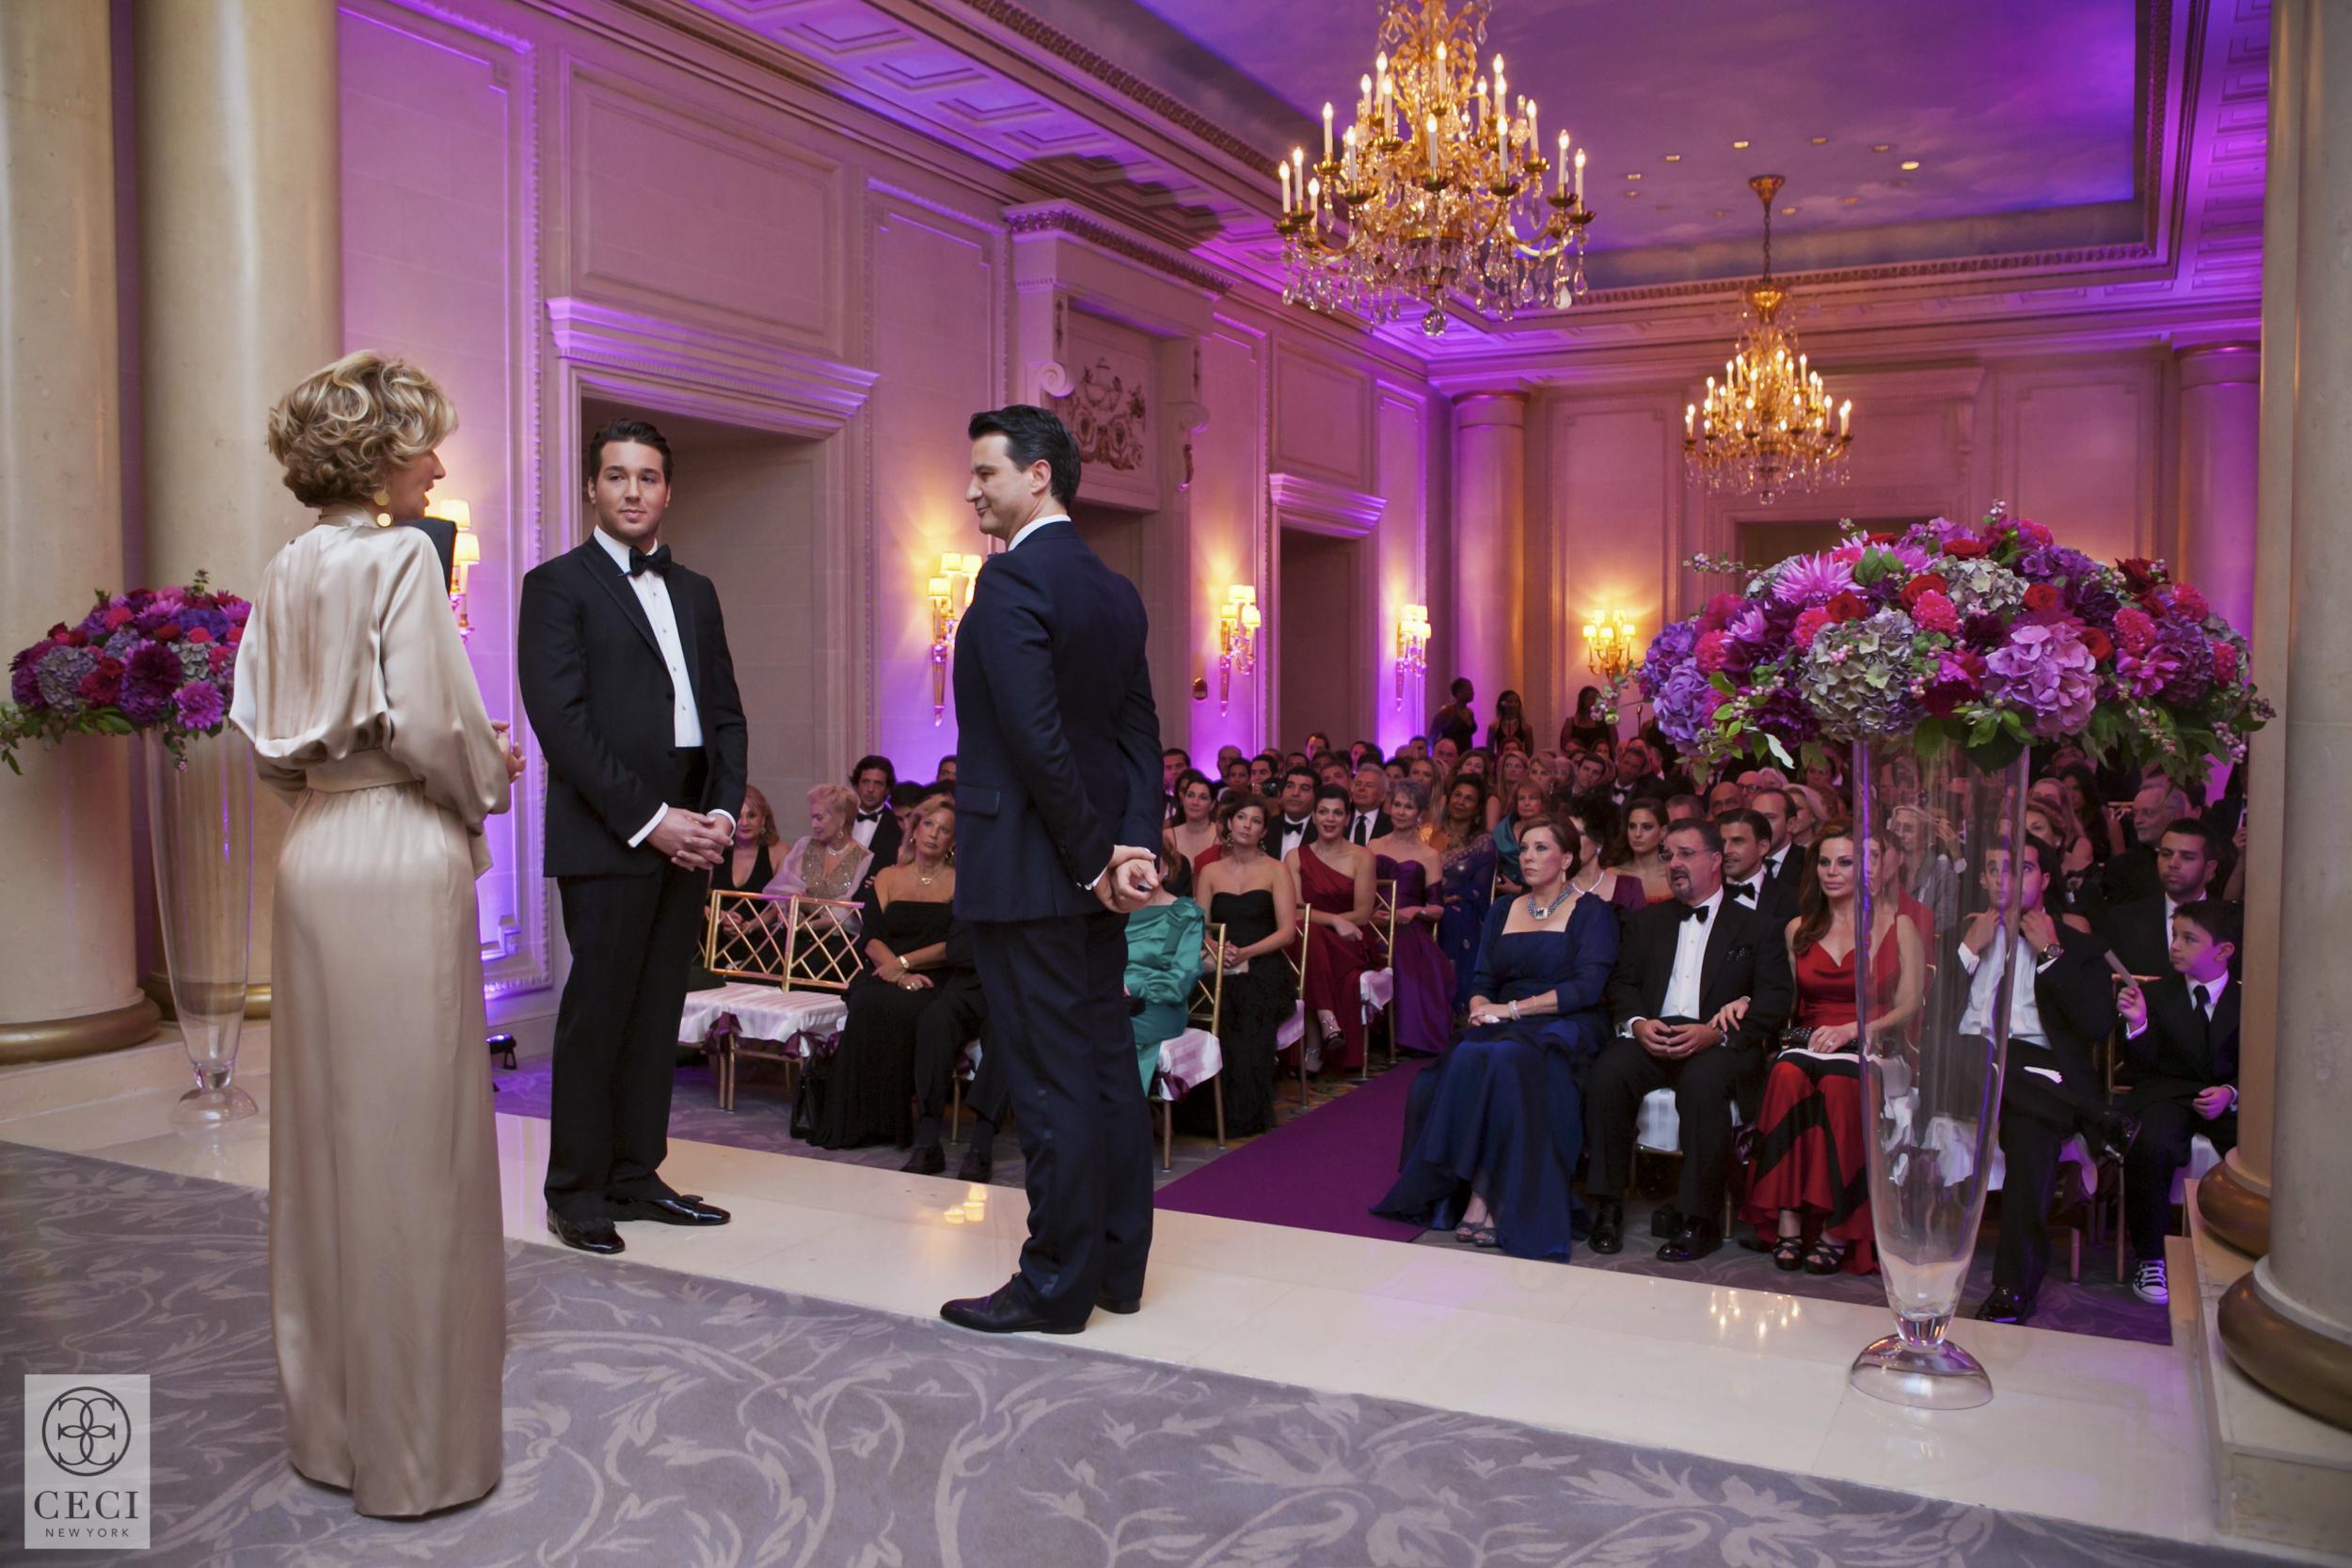 ceci_new_york_lucas_somoza_purple_regal_wediding_birthday_commitment_ceremony_gold-6.jpg